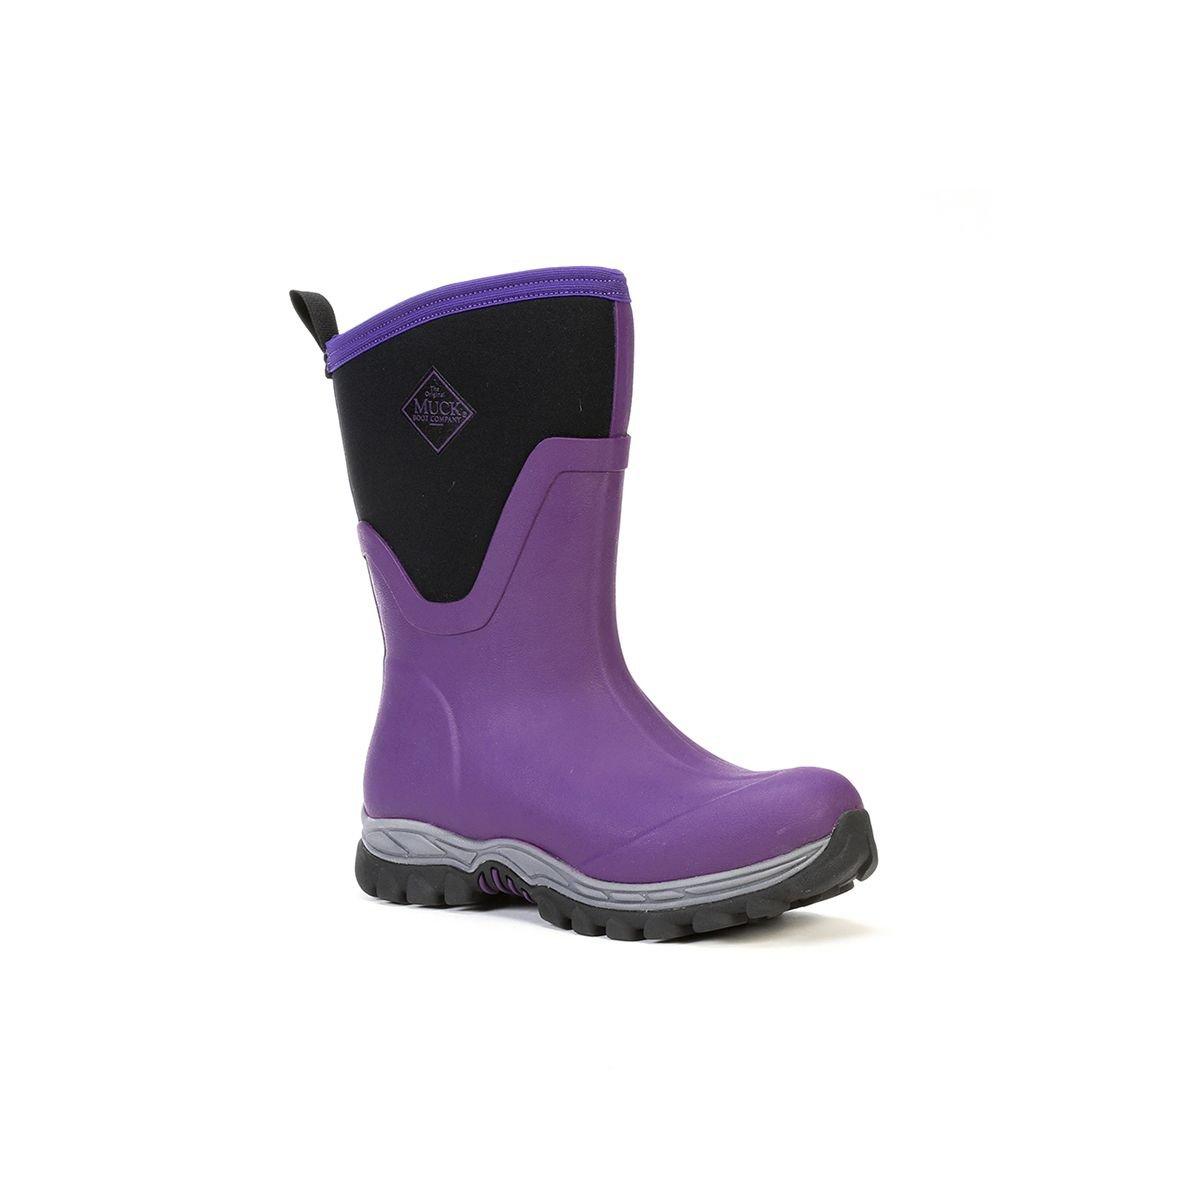 Muck Boot Company Women's Arctic Sport Ii Mid Winter Boots Socks, Purple, Size 7